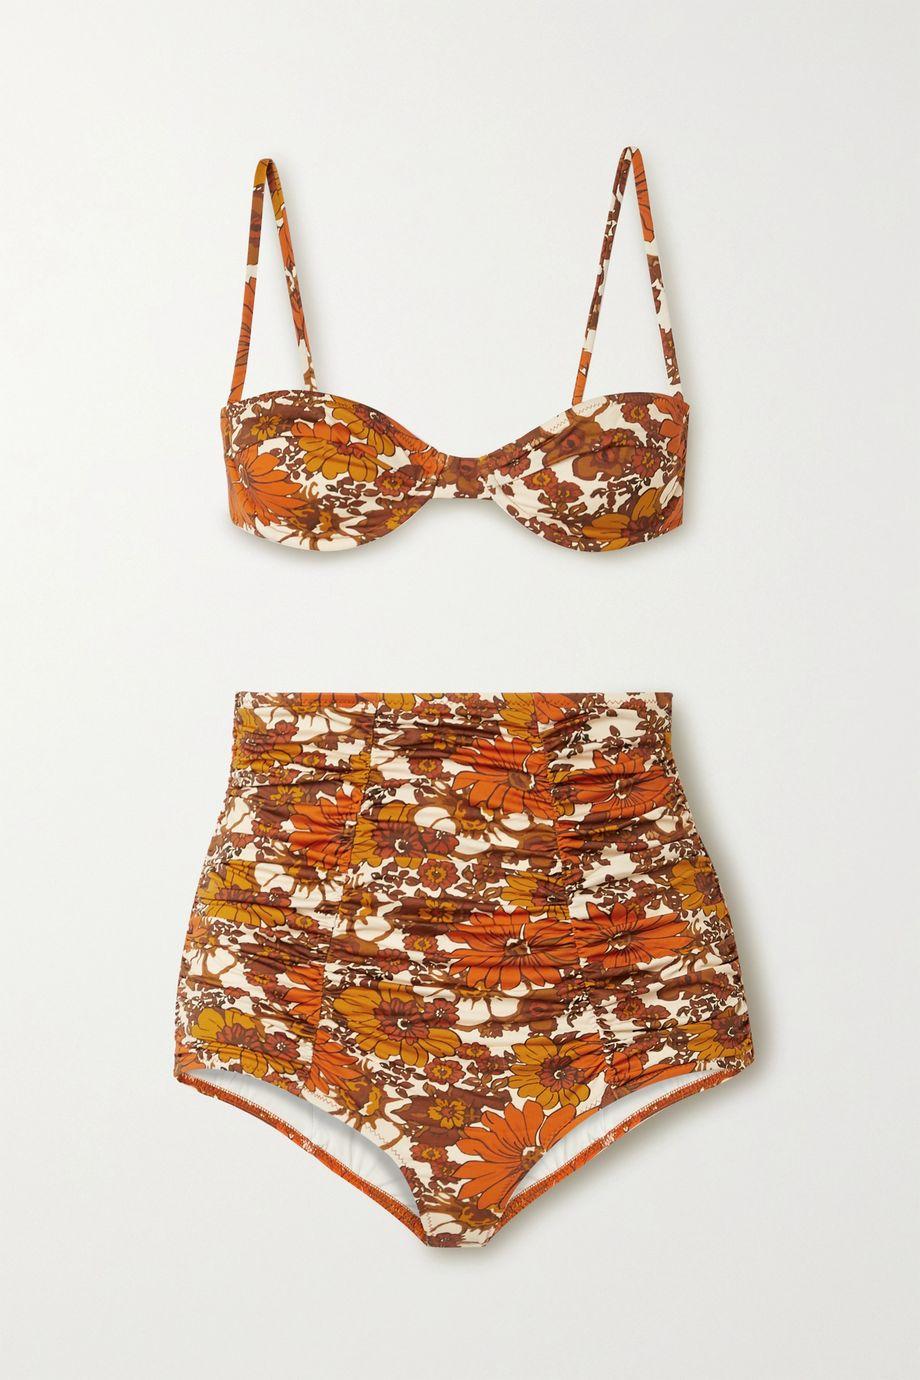 Dodo Bar Or Morgan and Alexia ruched floral-print bikini